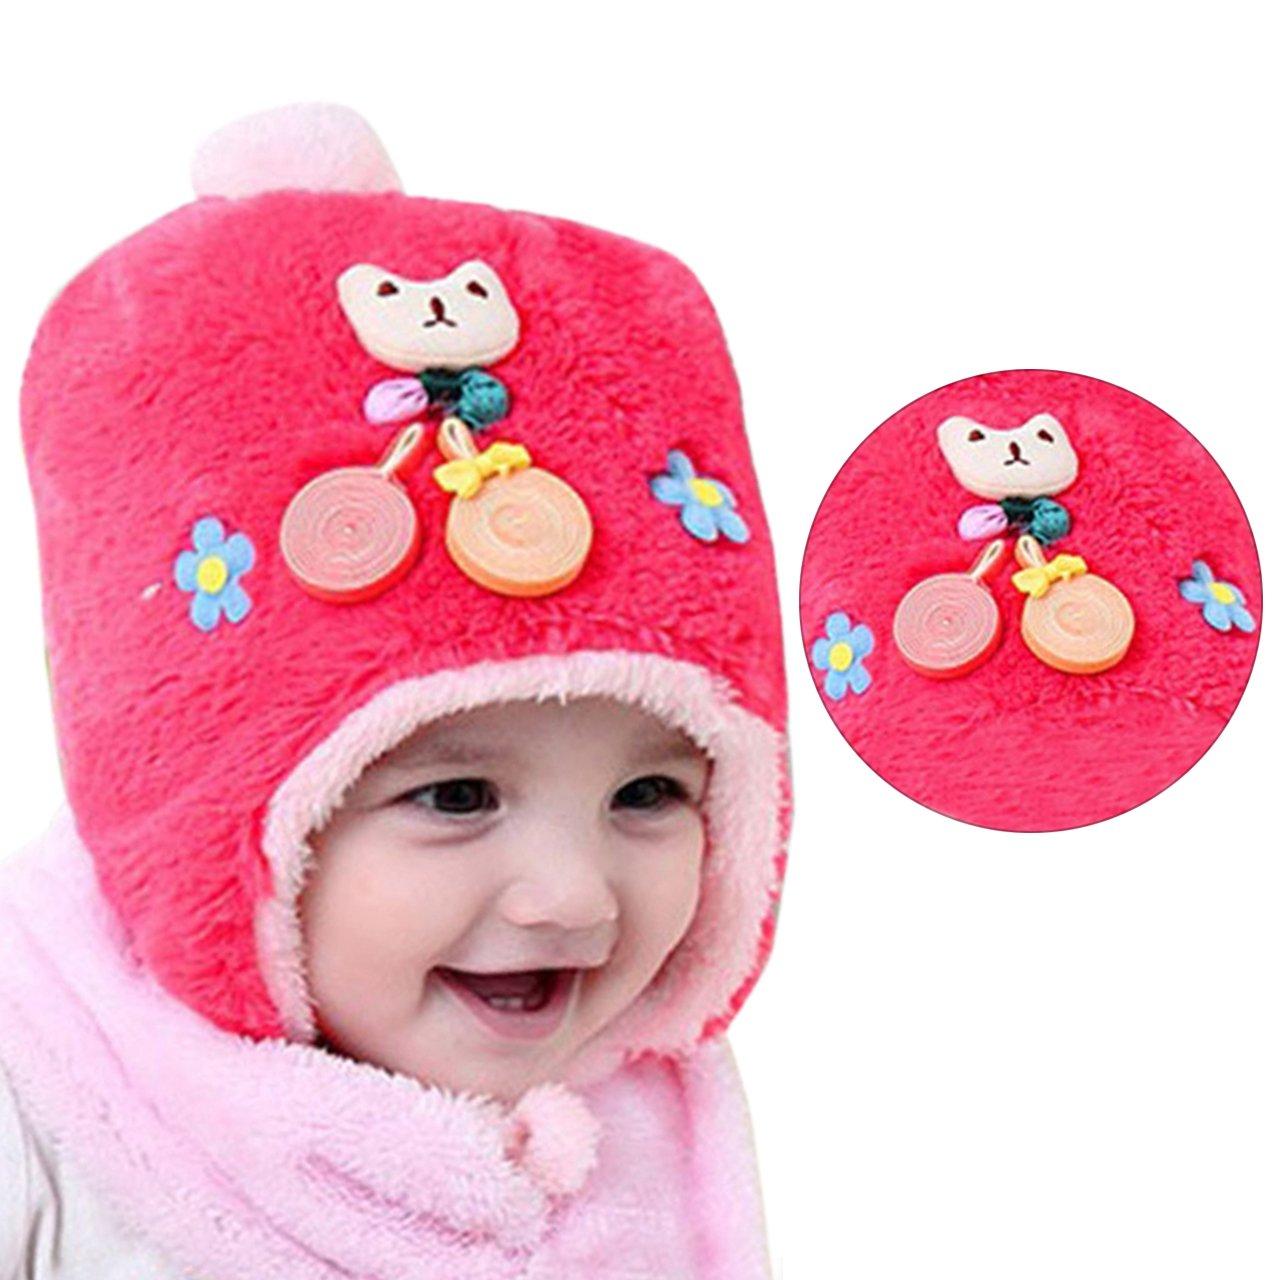 Girls Knitted Neck Warmer Headband, Bonice Winter Cute Snood Wool Scarf Warm Headscarf Cozy Pom Pom Chunky Scarves Gifts for 4-8 Year Old Girls - Grey BT-ertongweijingmazi-mise